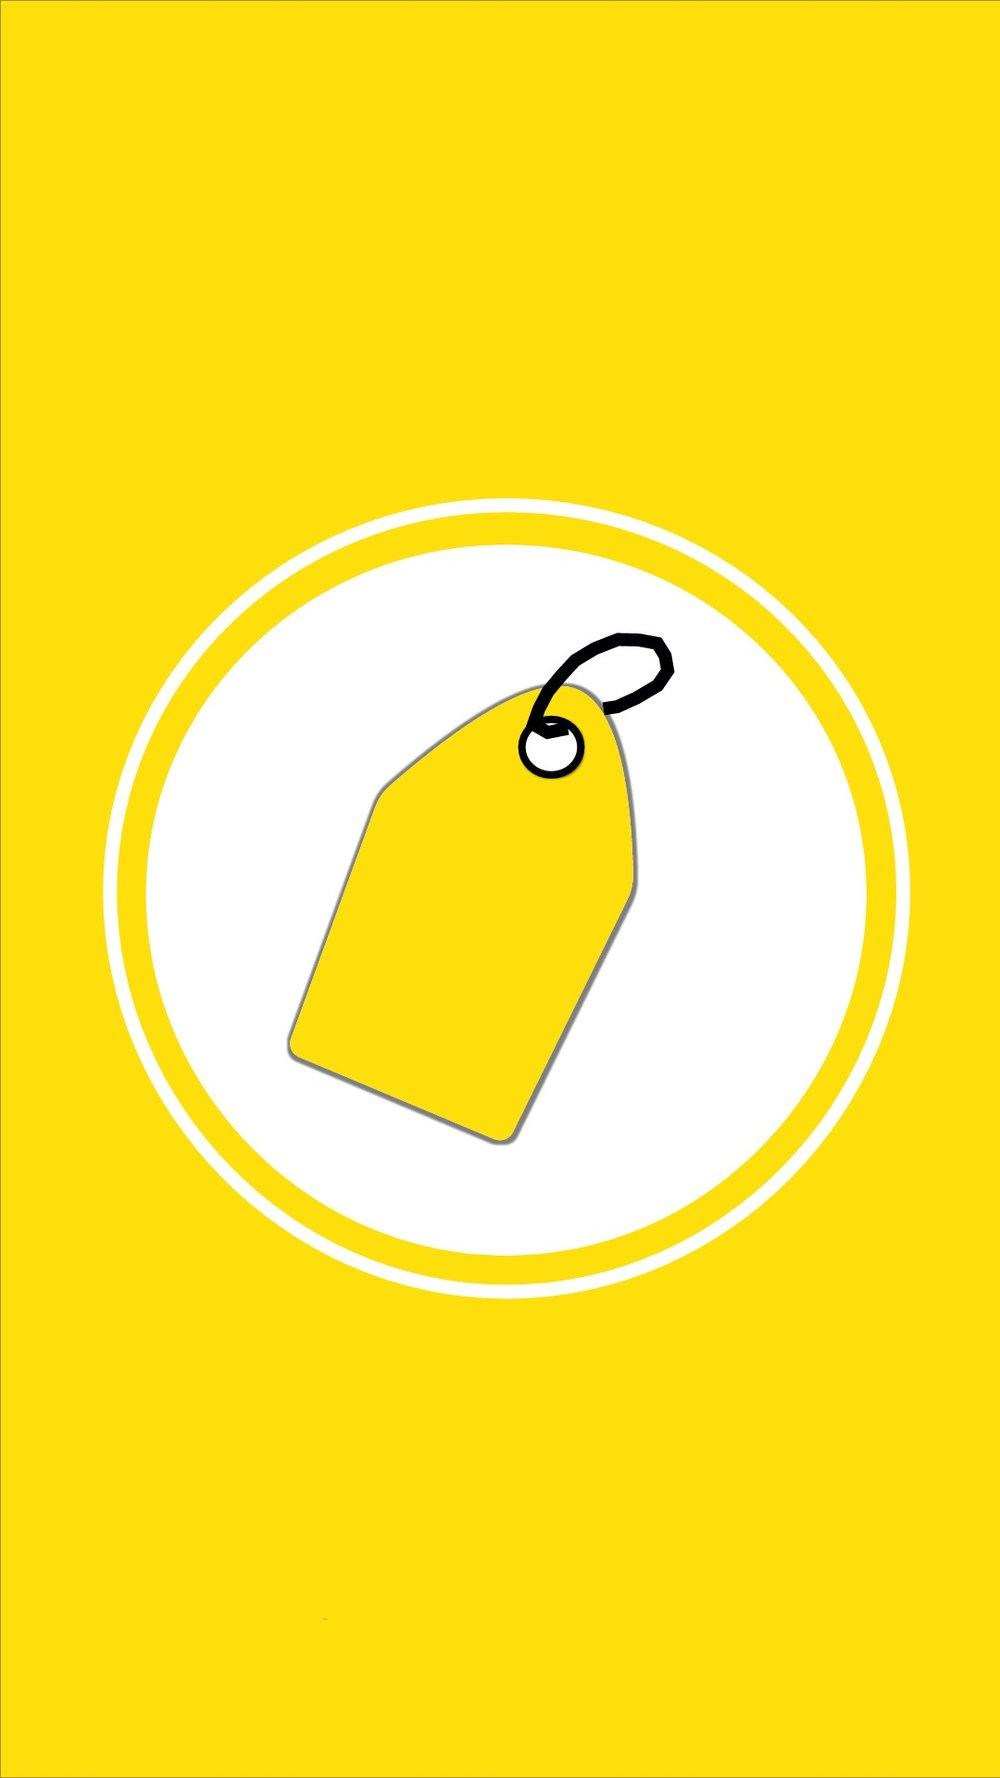 Instagram-cover-tag-yellow-lotnotes.com.jpg